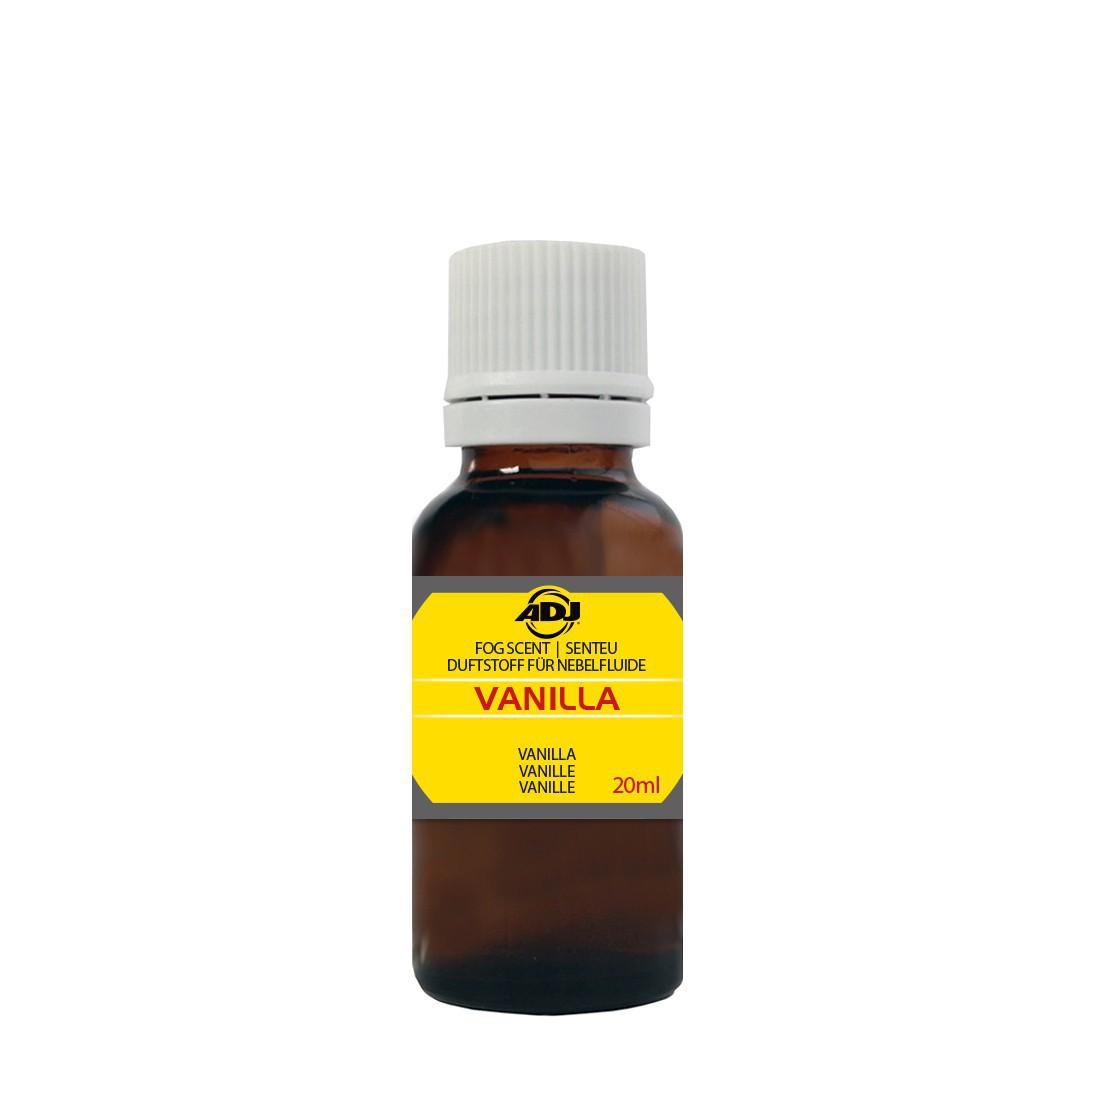 American DJ fog scent vanilla 20ml - Zapach do dymu